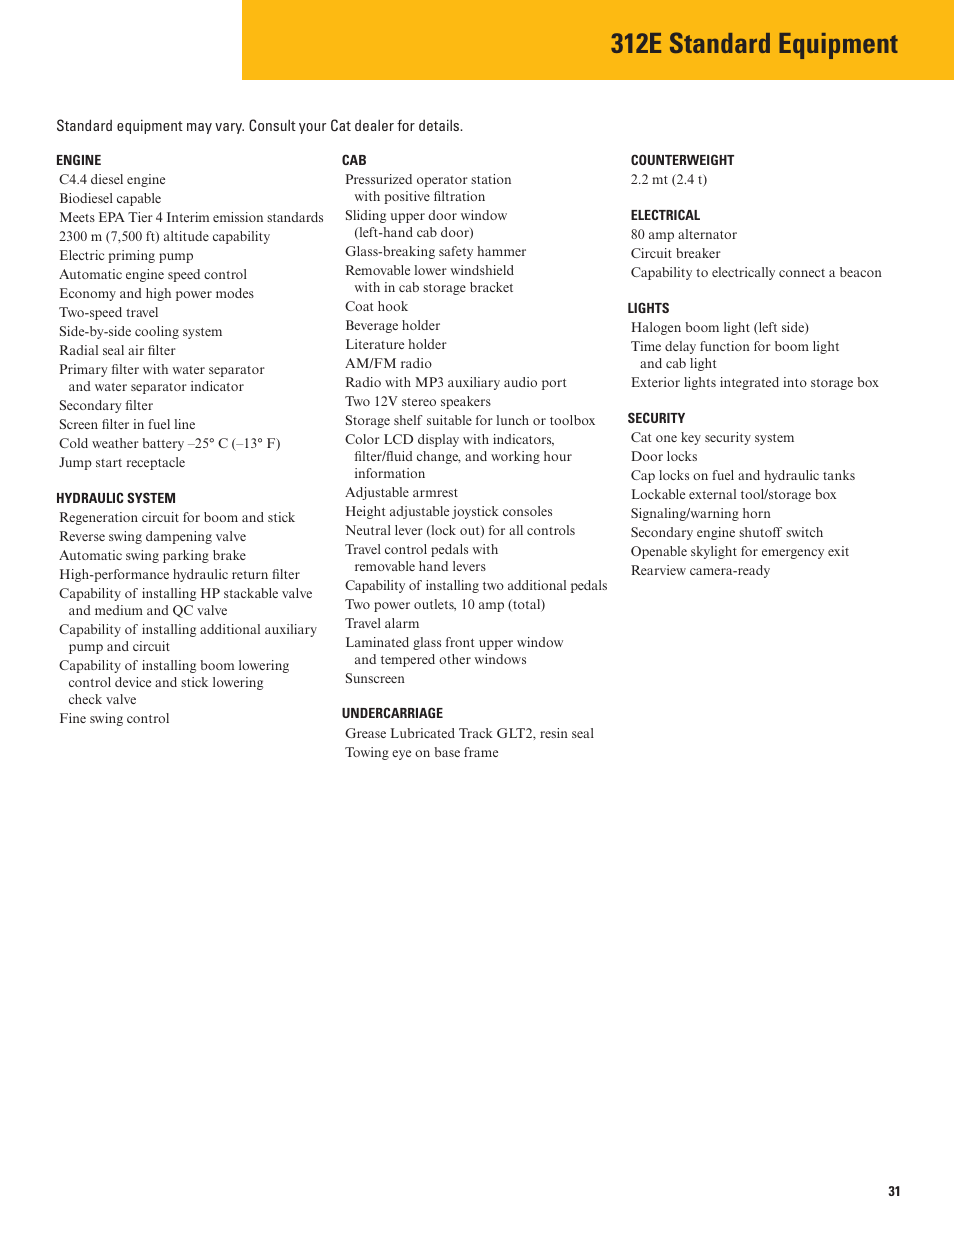 Standard equipment, 312e standard equipment | Milton CAT 312E User Manual |  Page 31 /